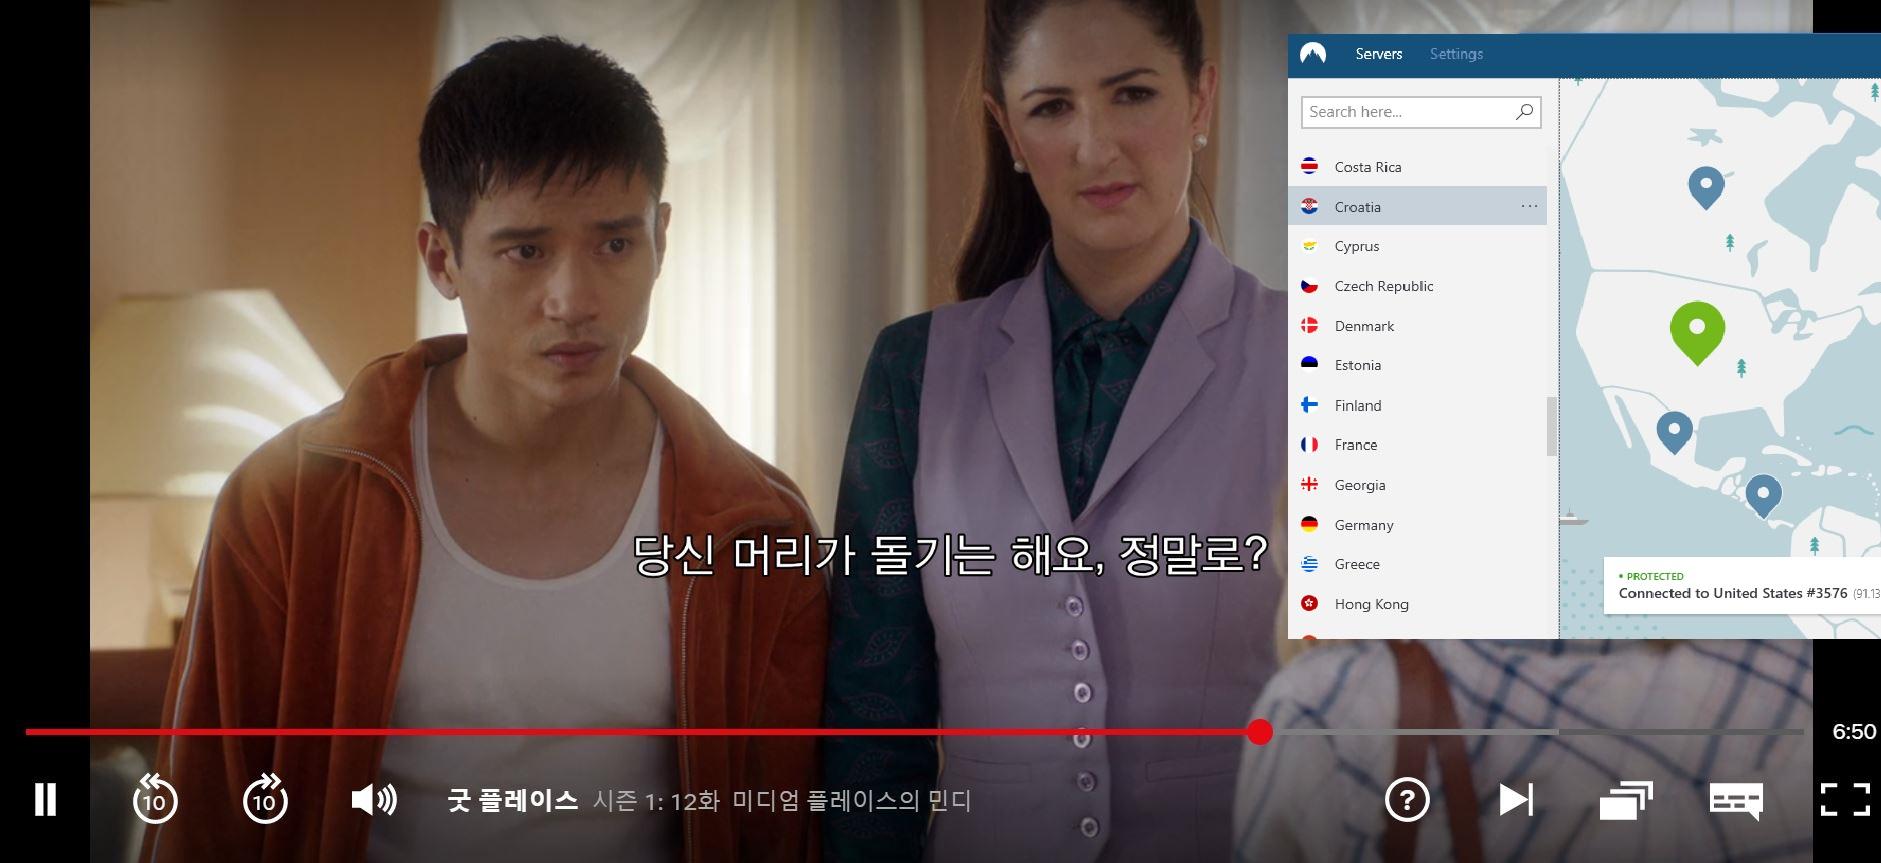 NordVPN의 스크린 샷으로 Netflix US 차단 해제